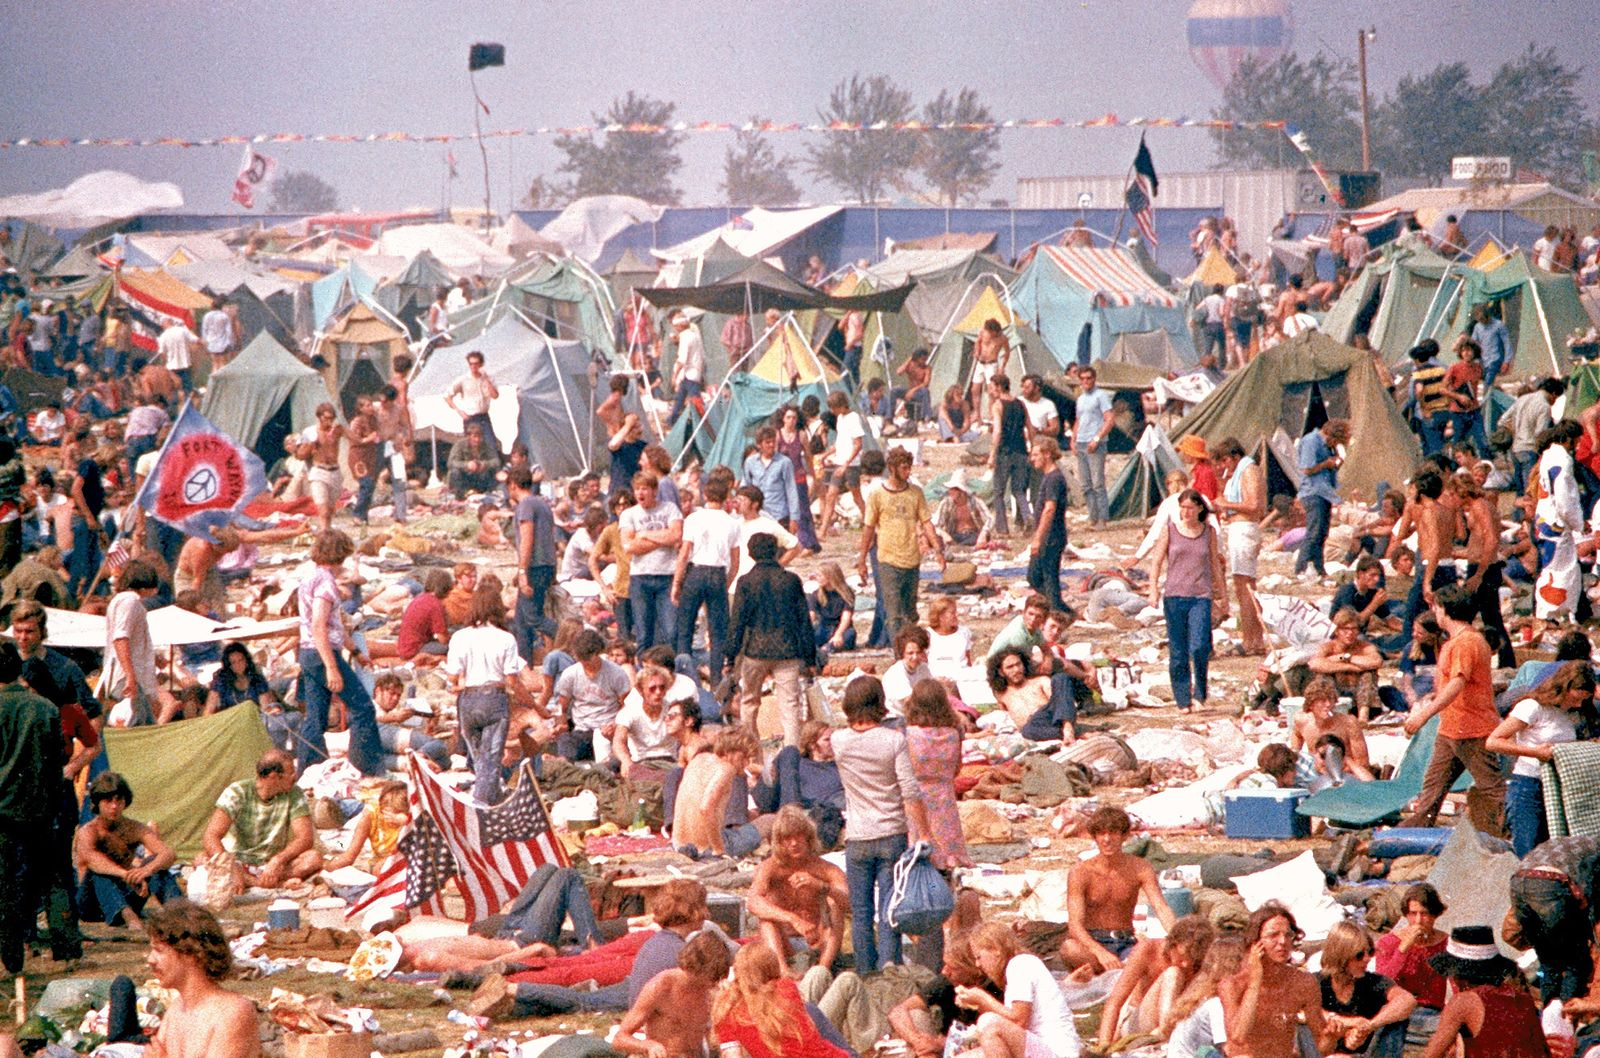 Hippie Festival / Rolling Stones